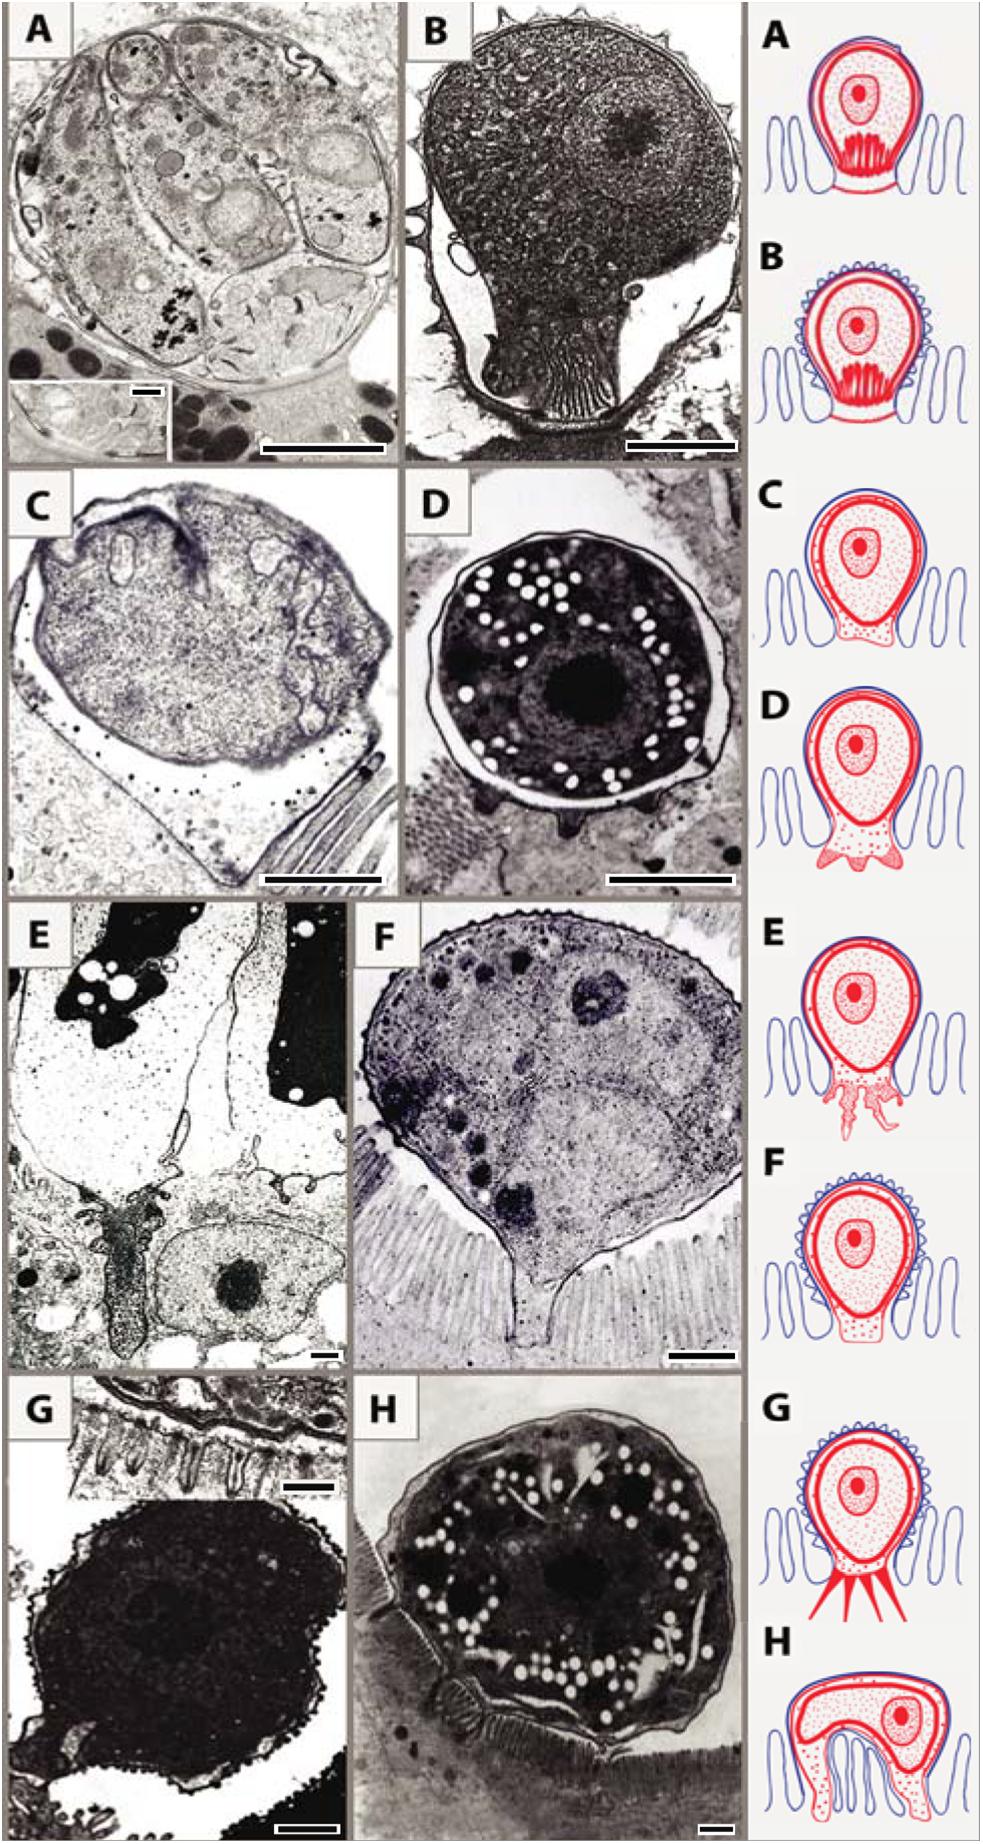 Schematic interpretation of host–parasite interactions of epicellular piscine cryptosporidians and coccidians.